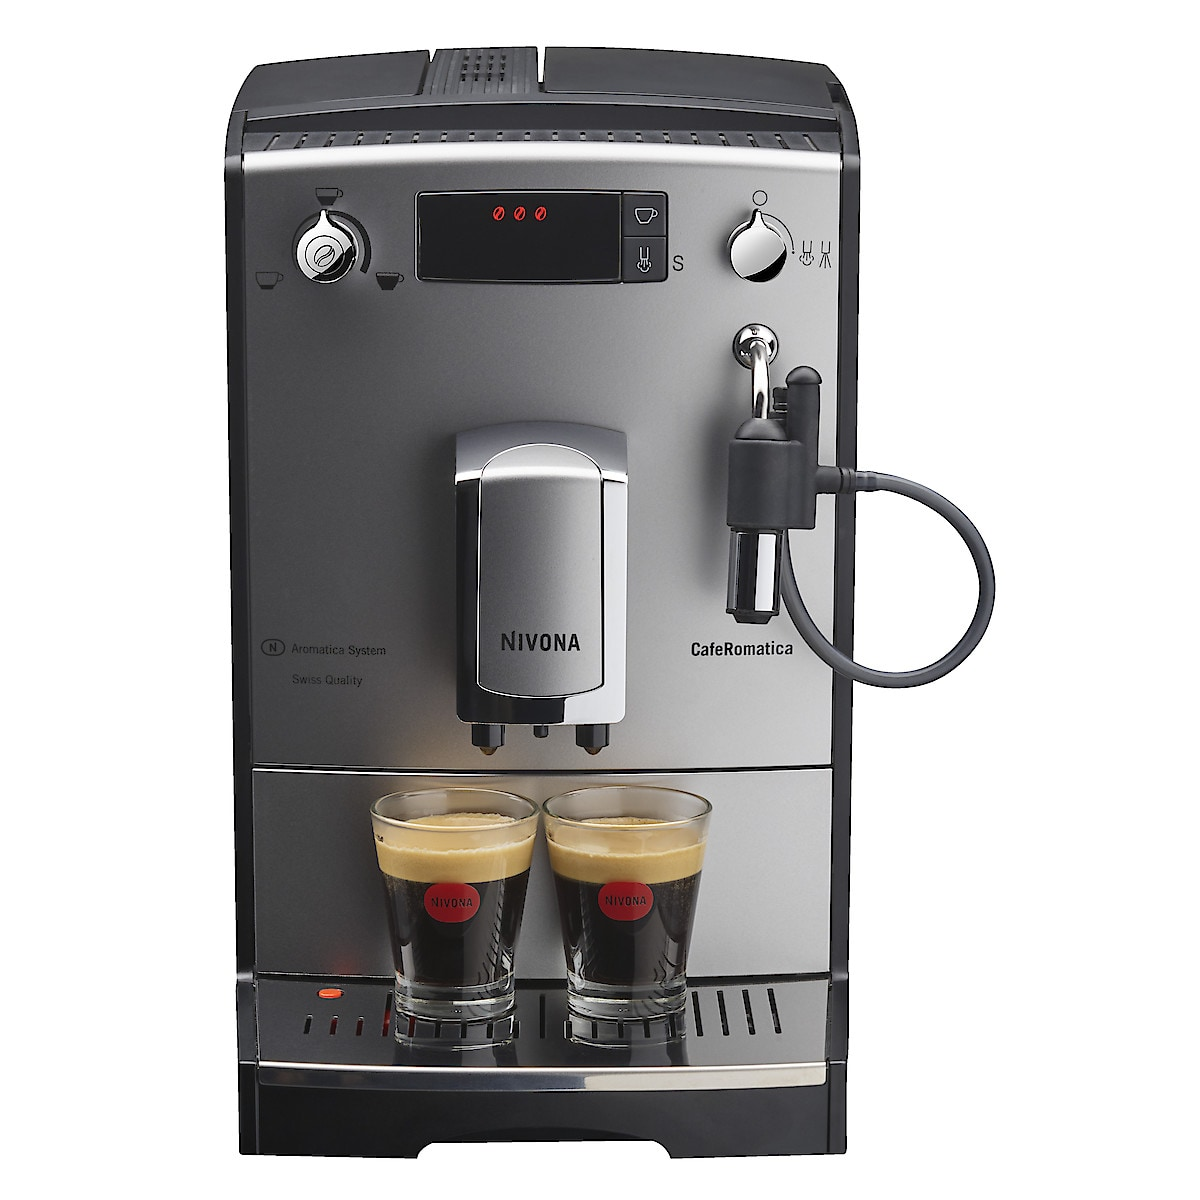 Kaffemaskin Nivona CafeRomatica 530